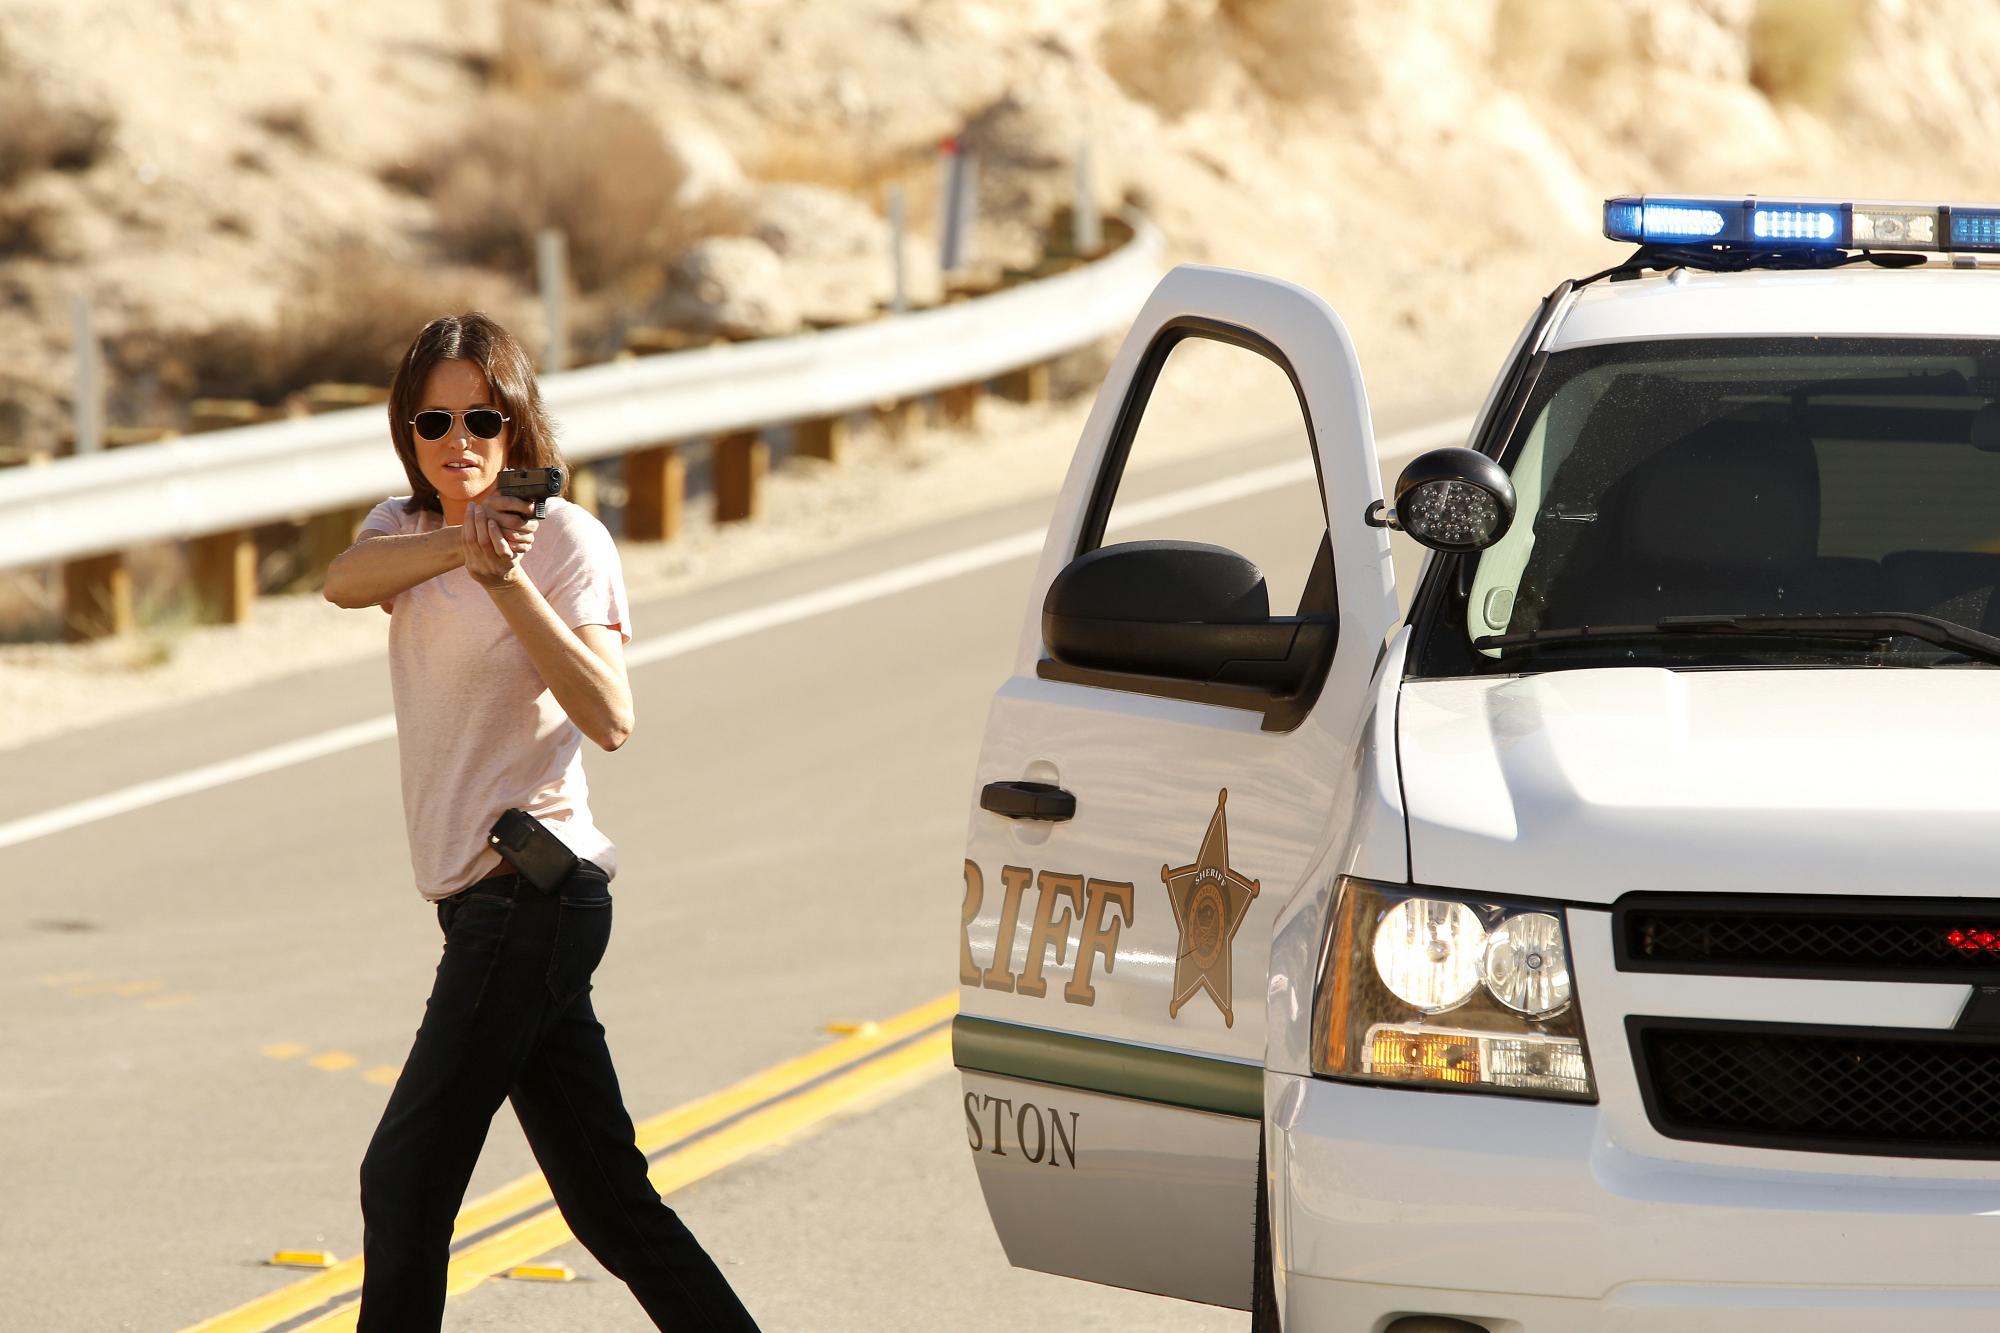 10. Sara Sidle - CSI: Crime Scene Investigation